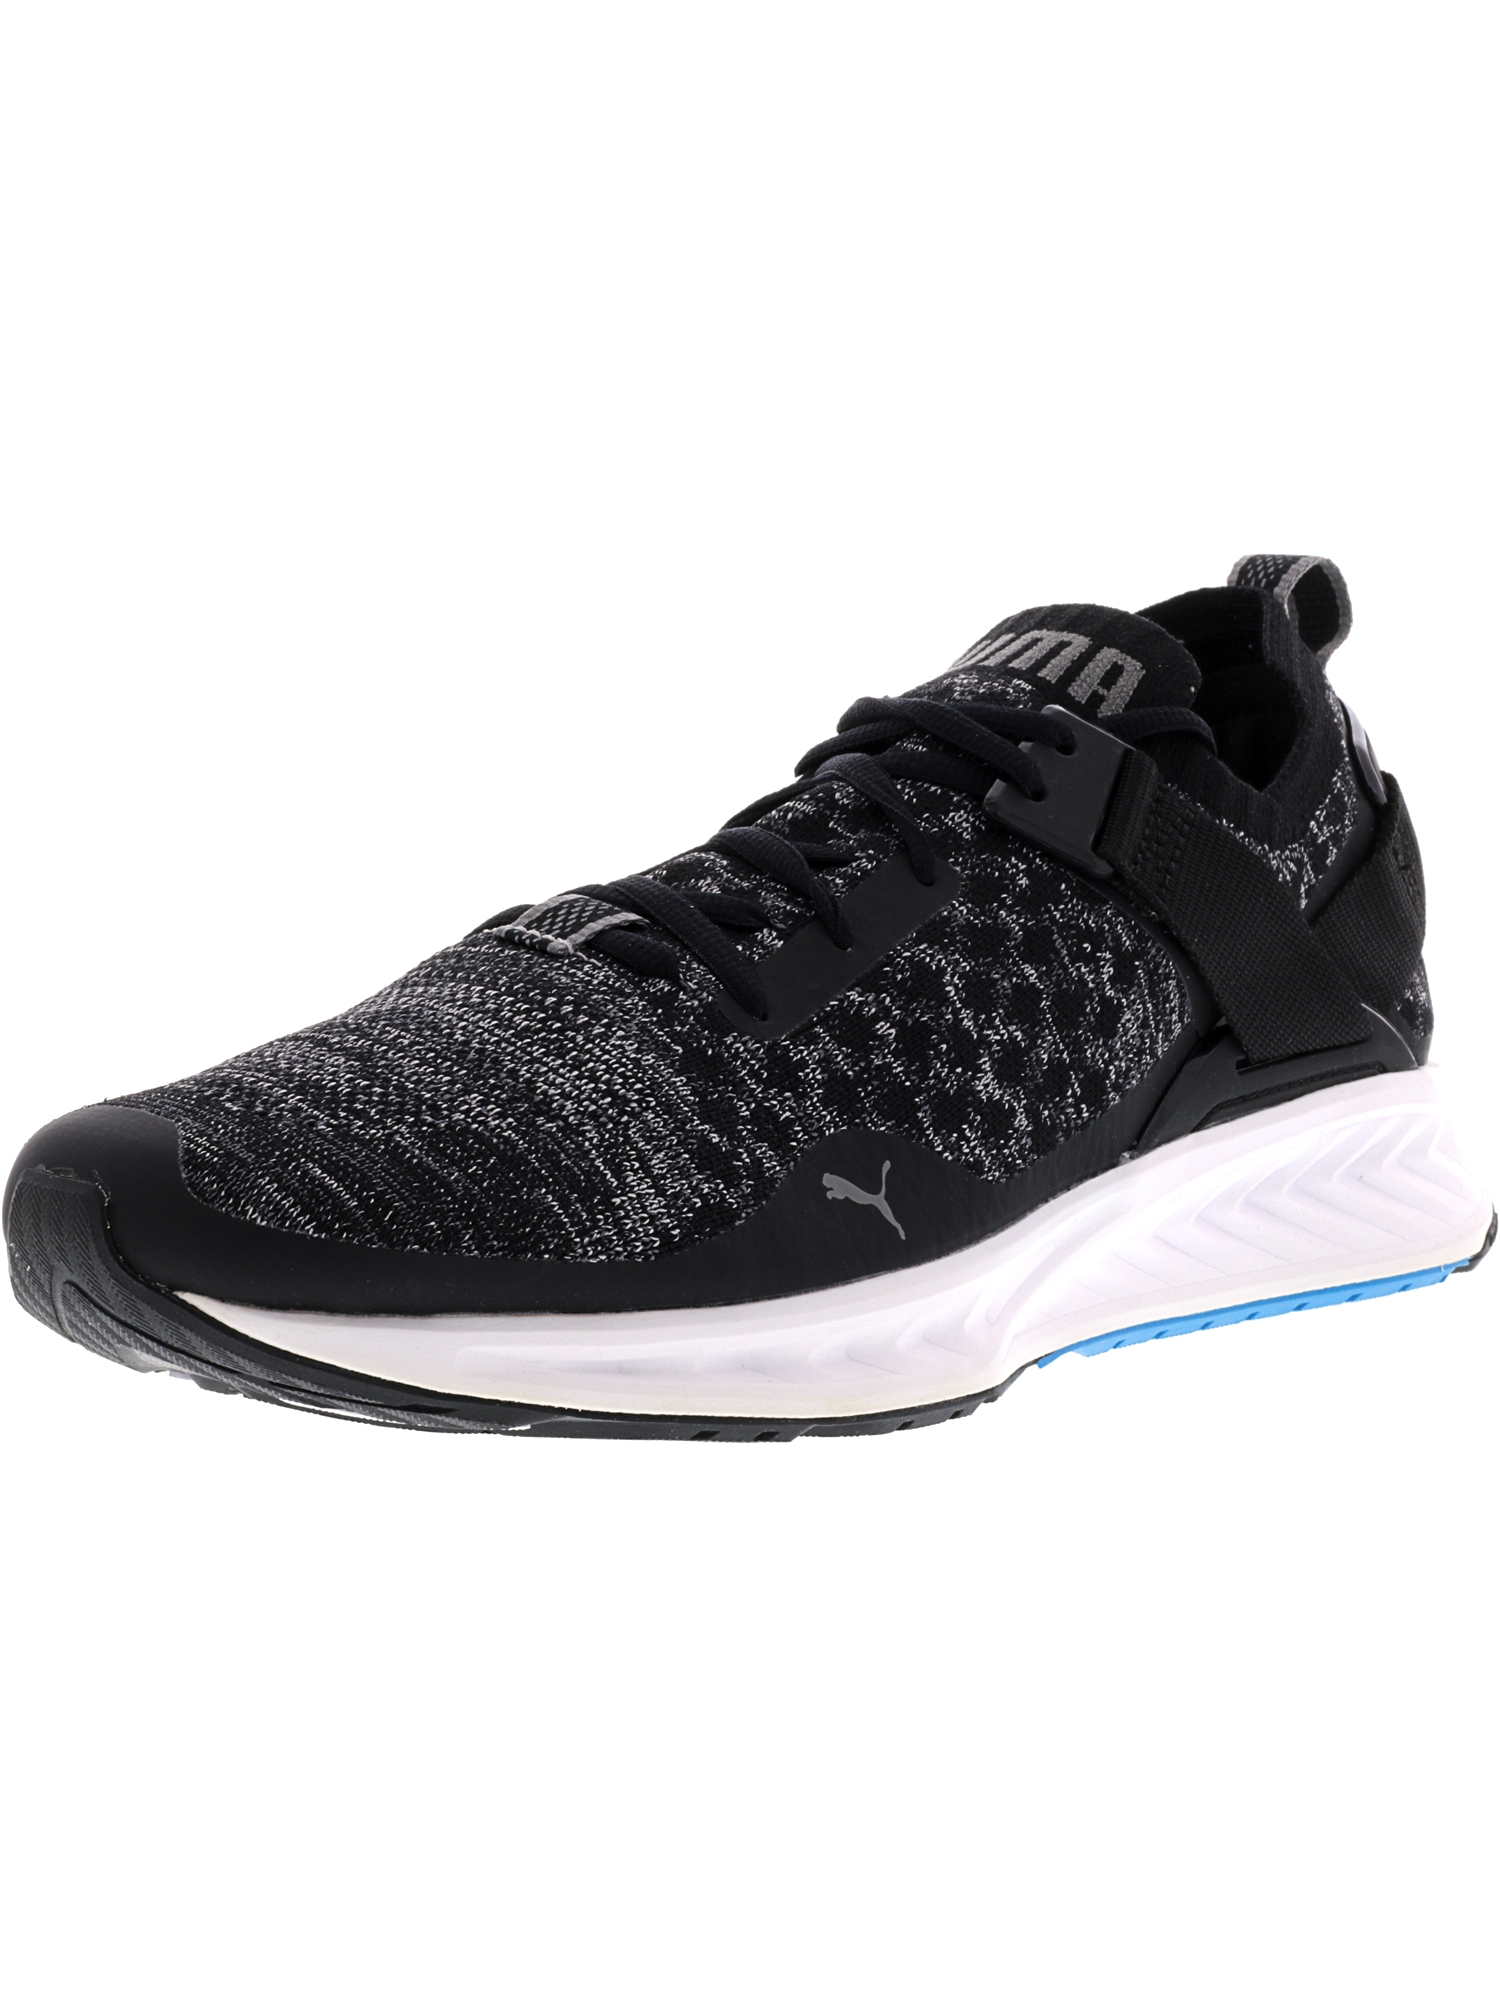 Puma Men's Ignite Evoknit Lo Black / Blue Quiet Shade Ankle-High Running Shoe - 12M